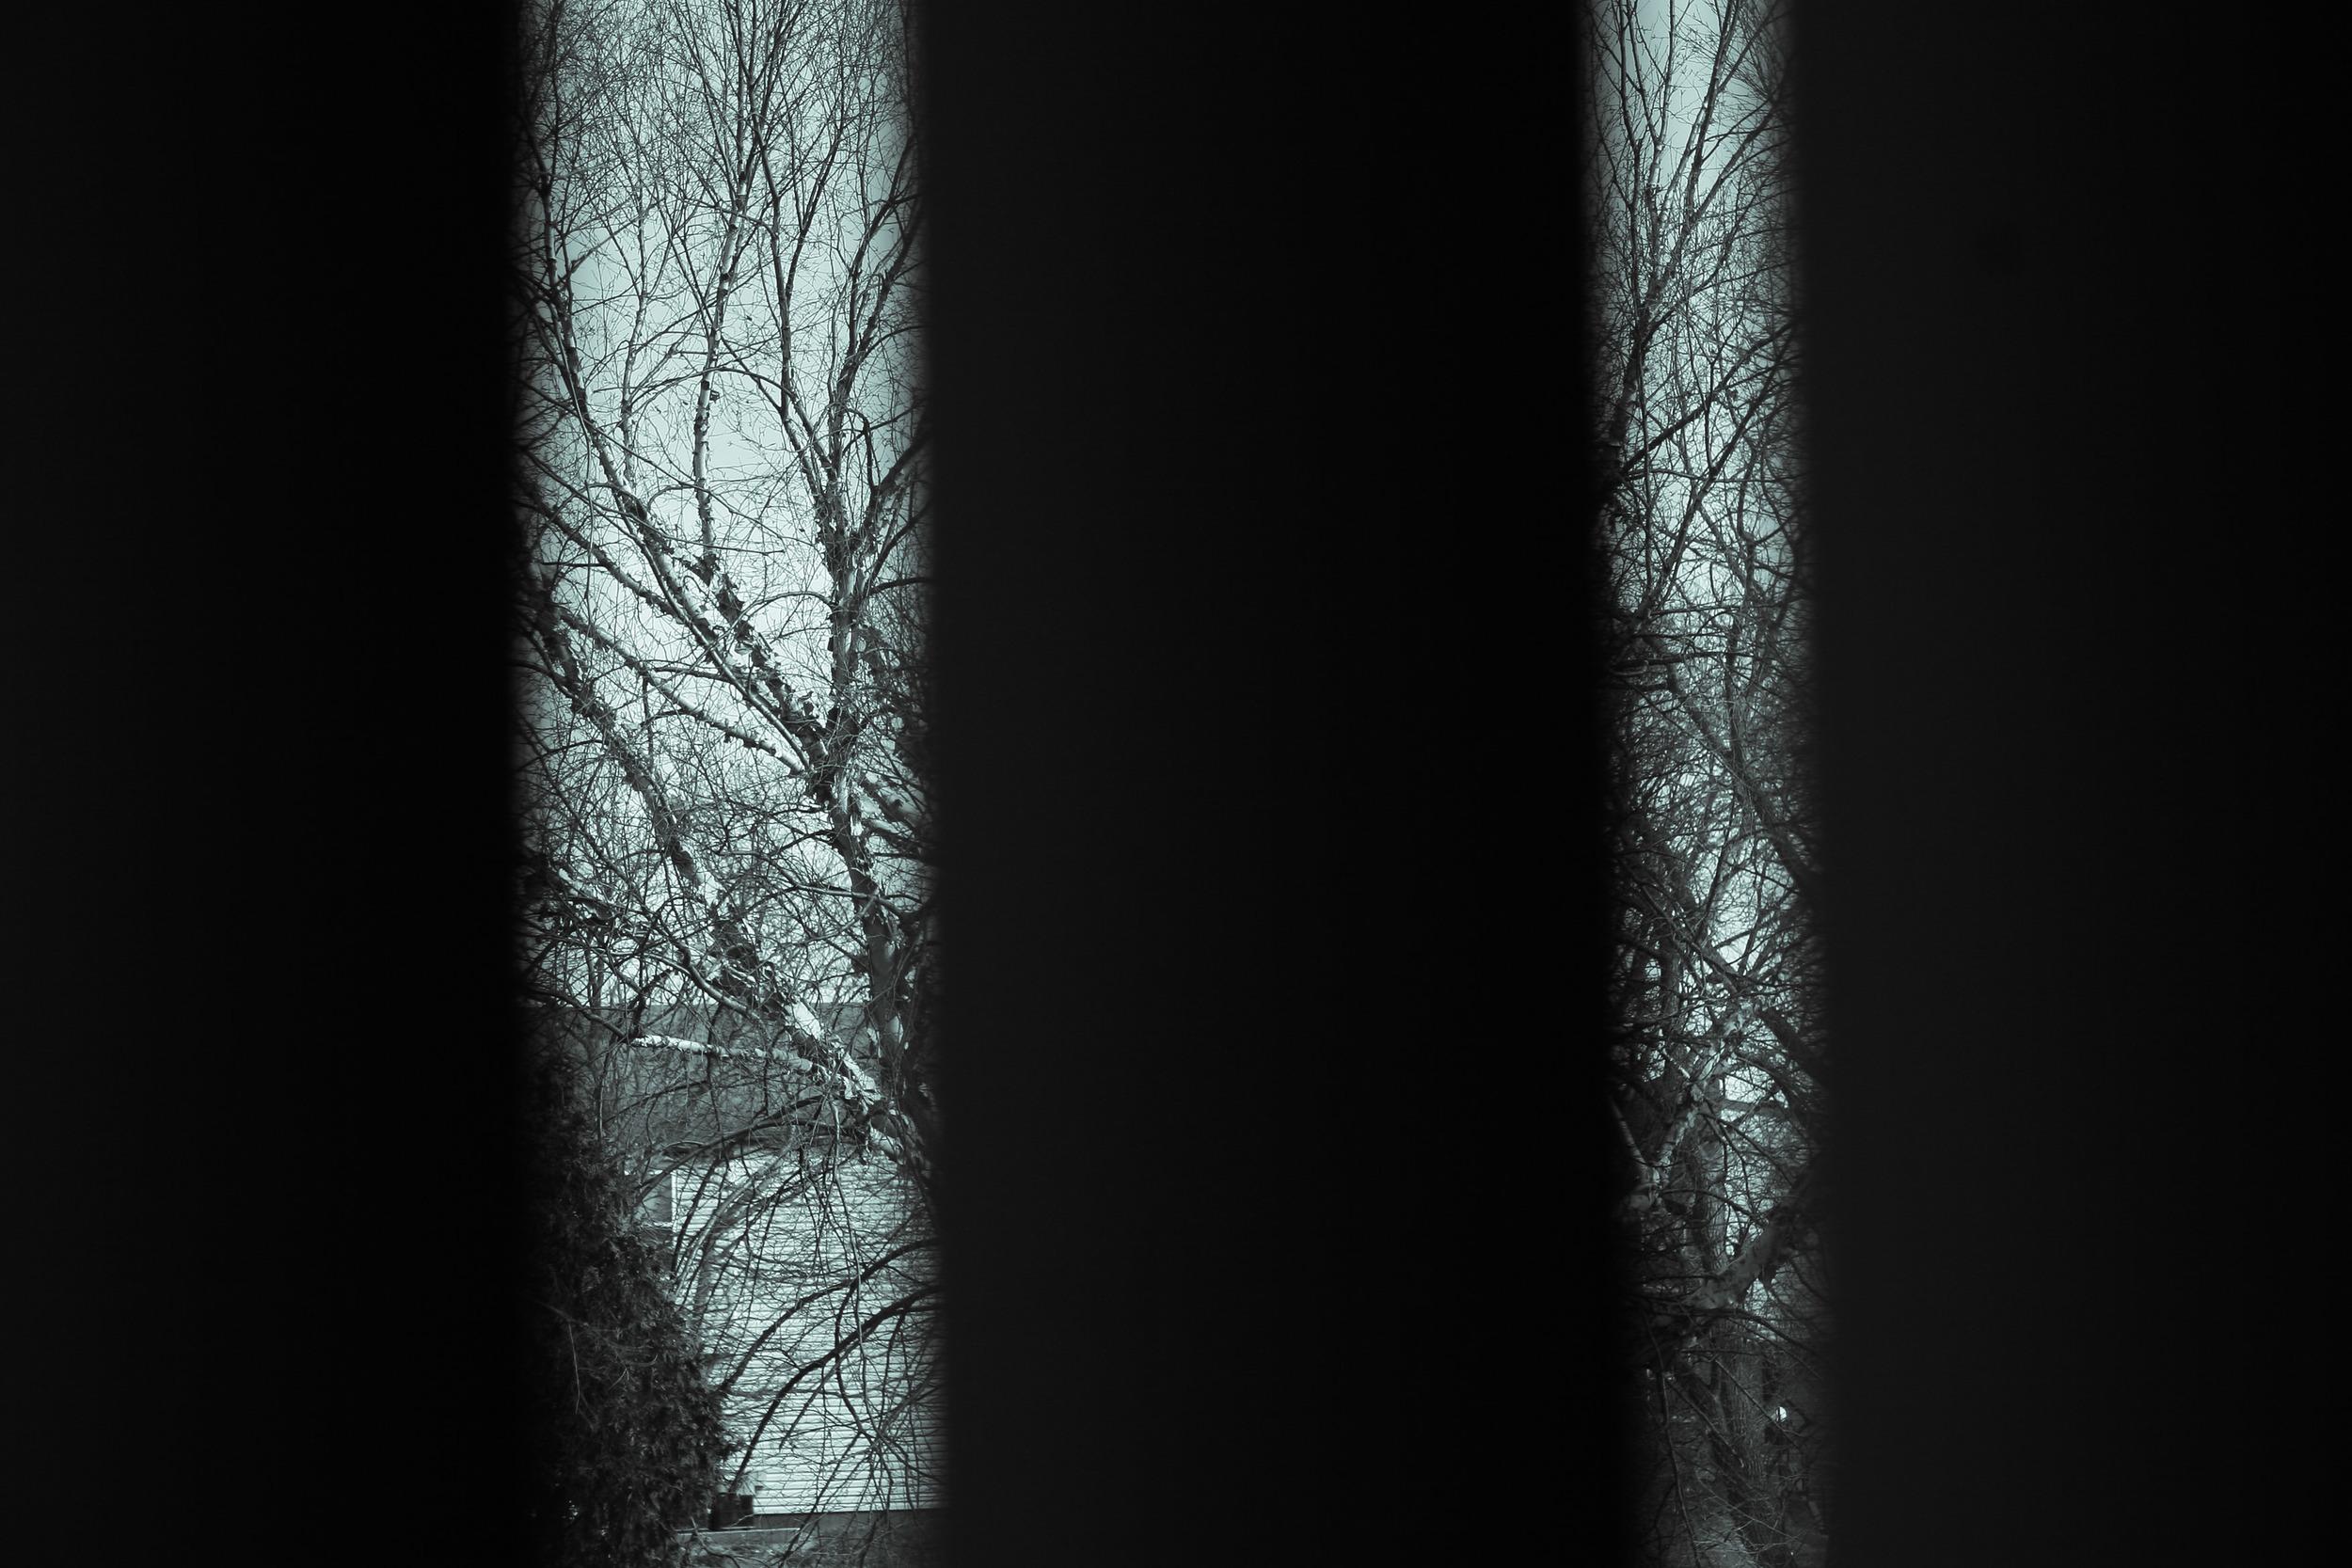 Through That Window